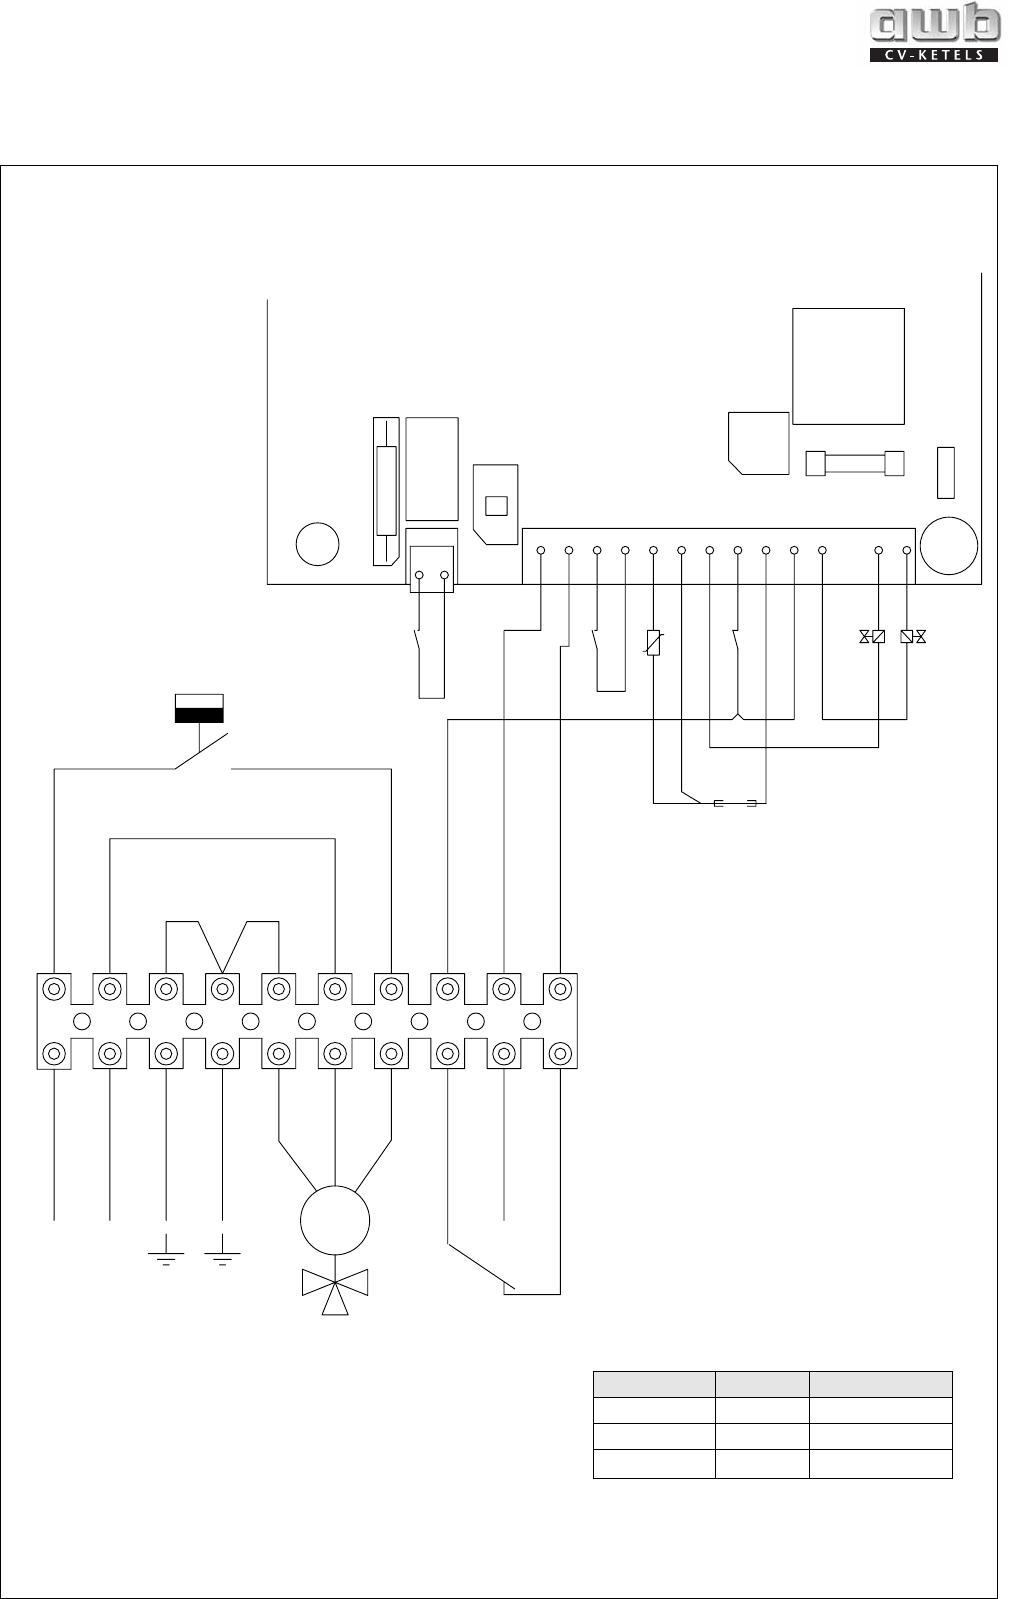 handleiding awb thermomastervr 23 29wt  pagina 23 van 28